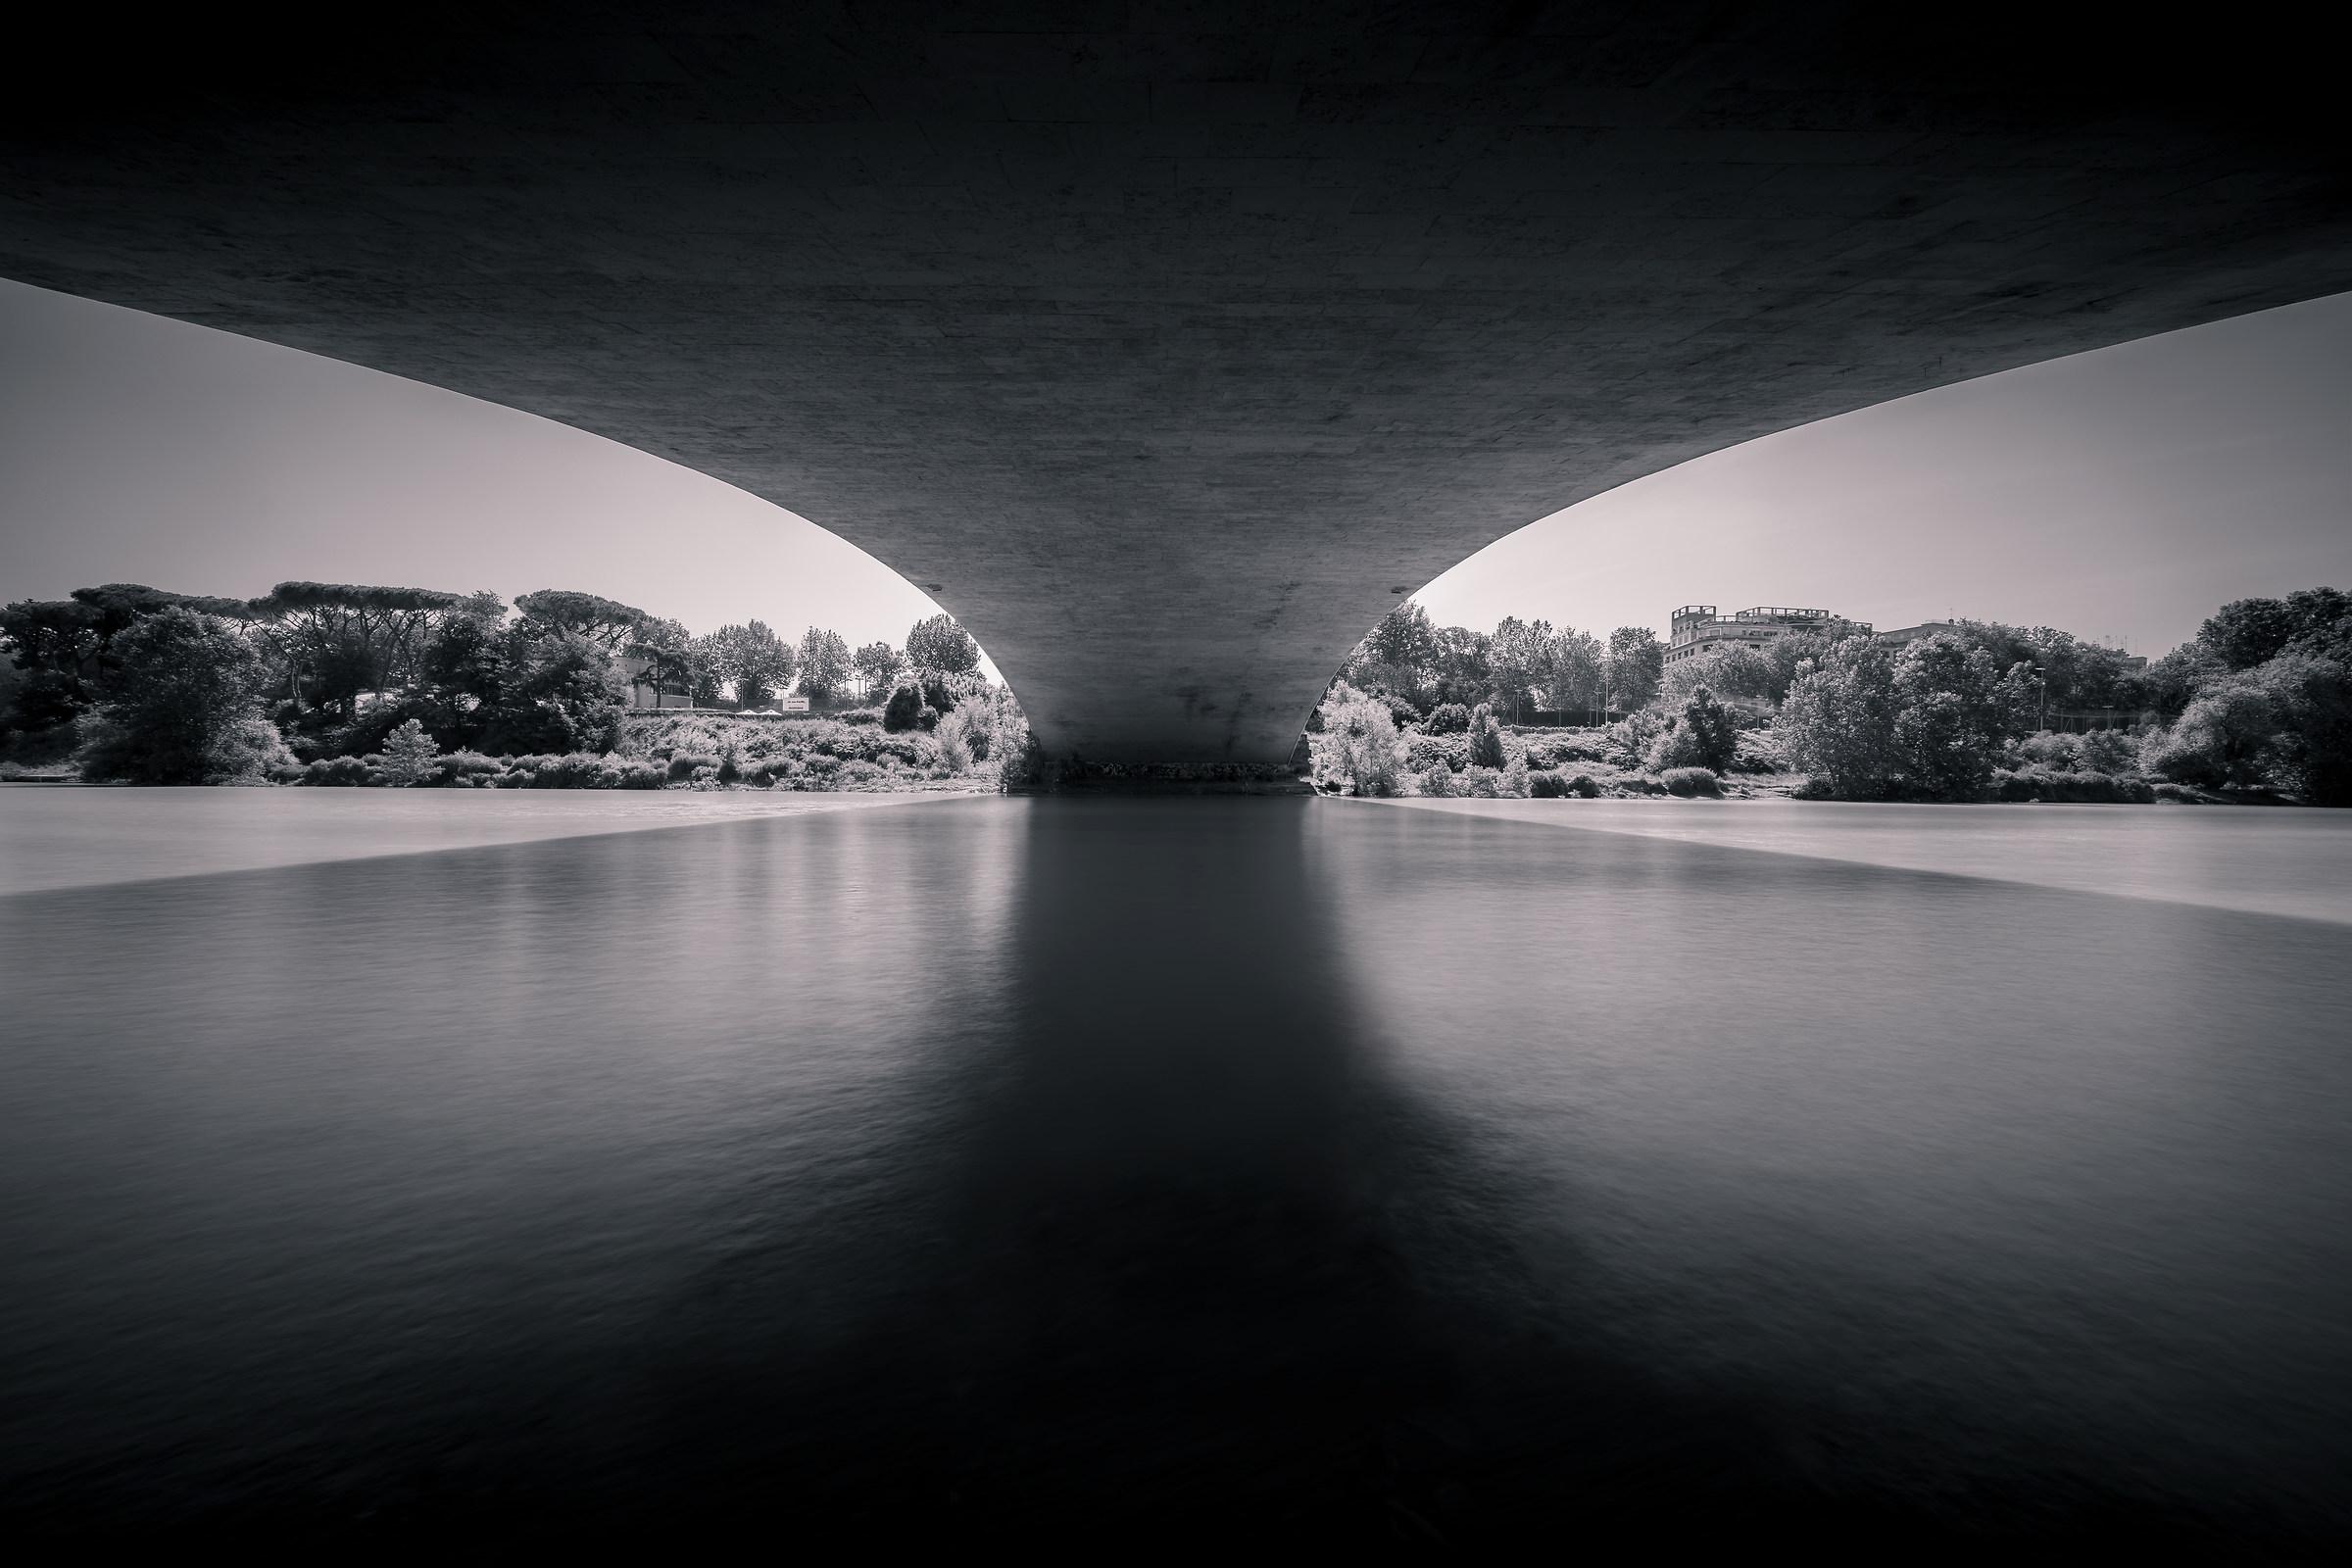 The Bridge of the Duke...